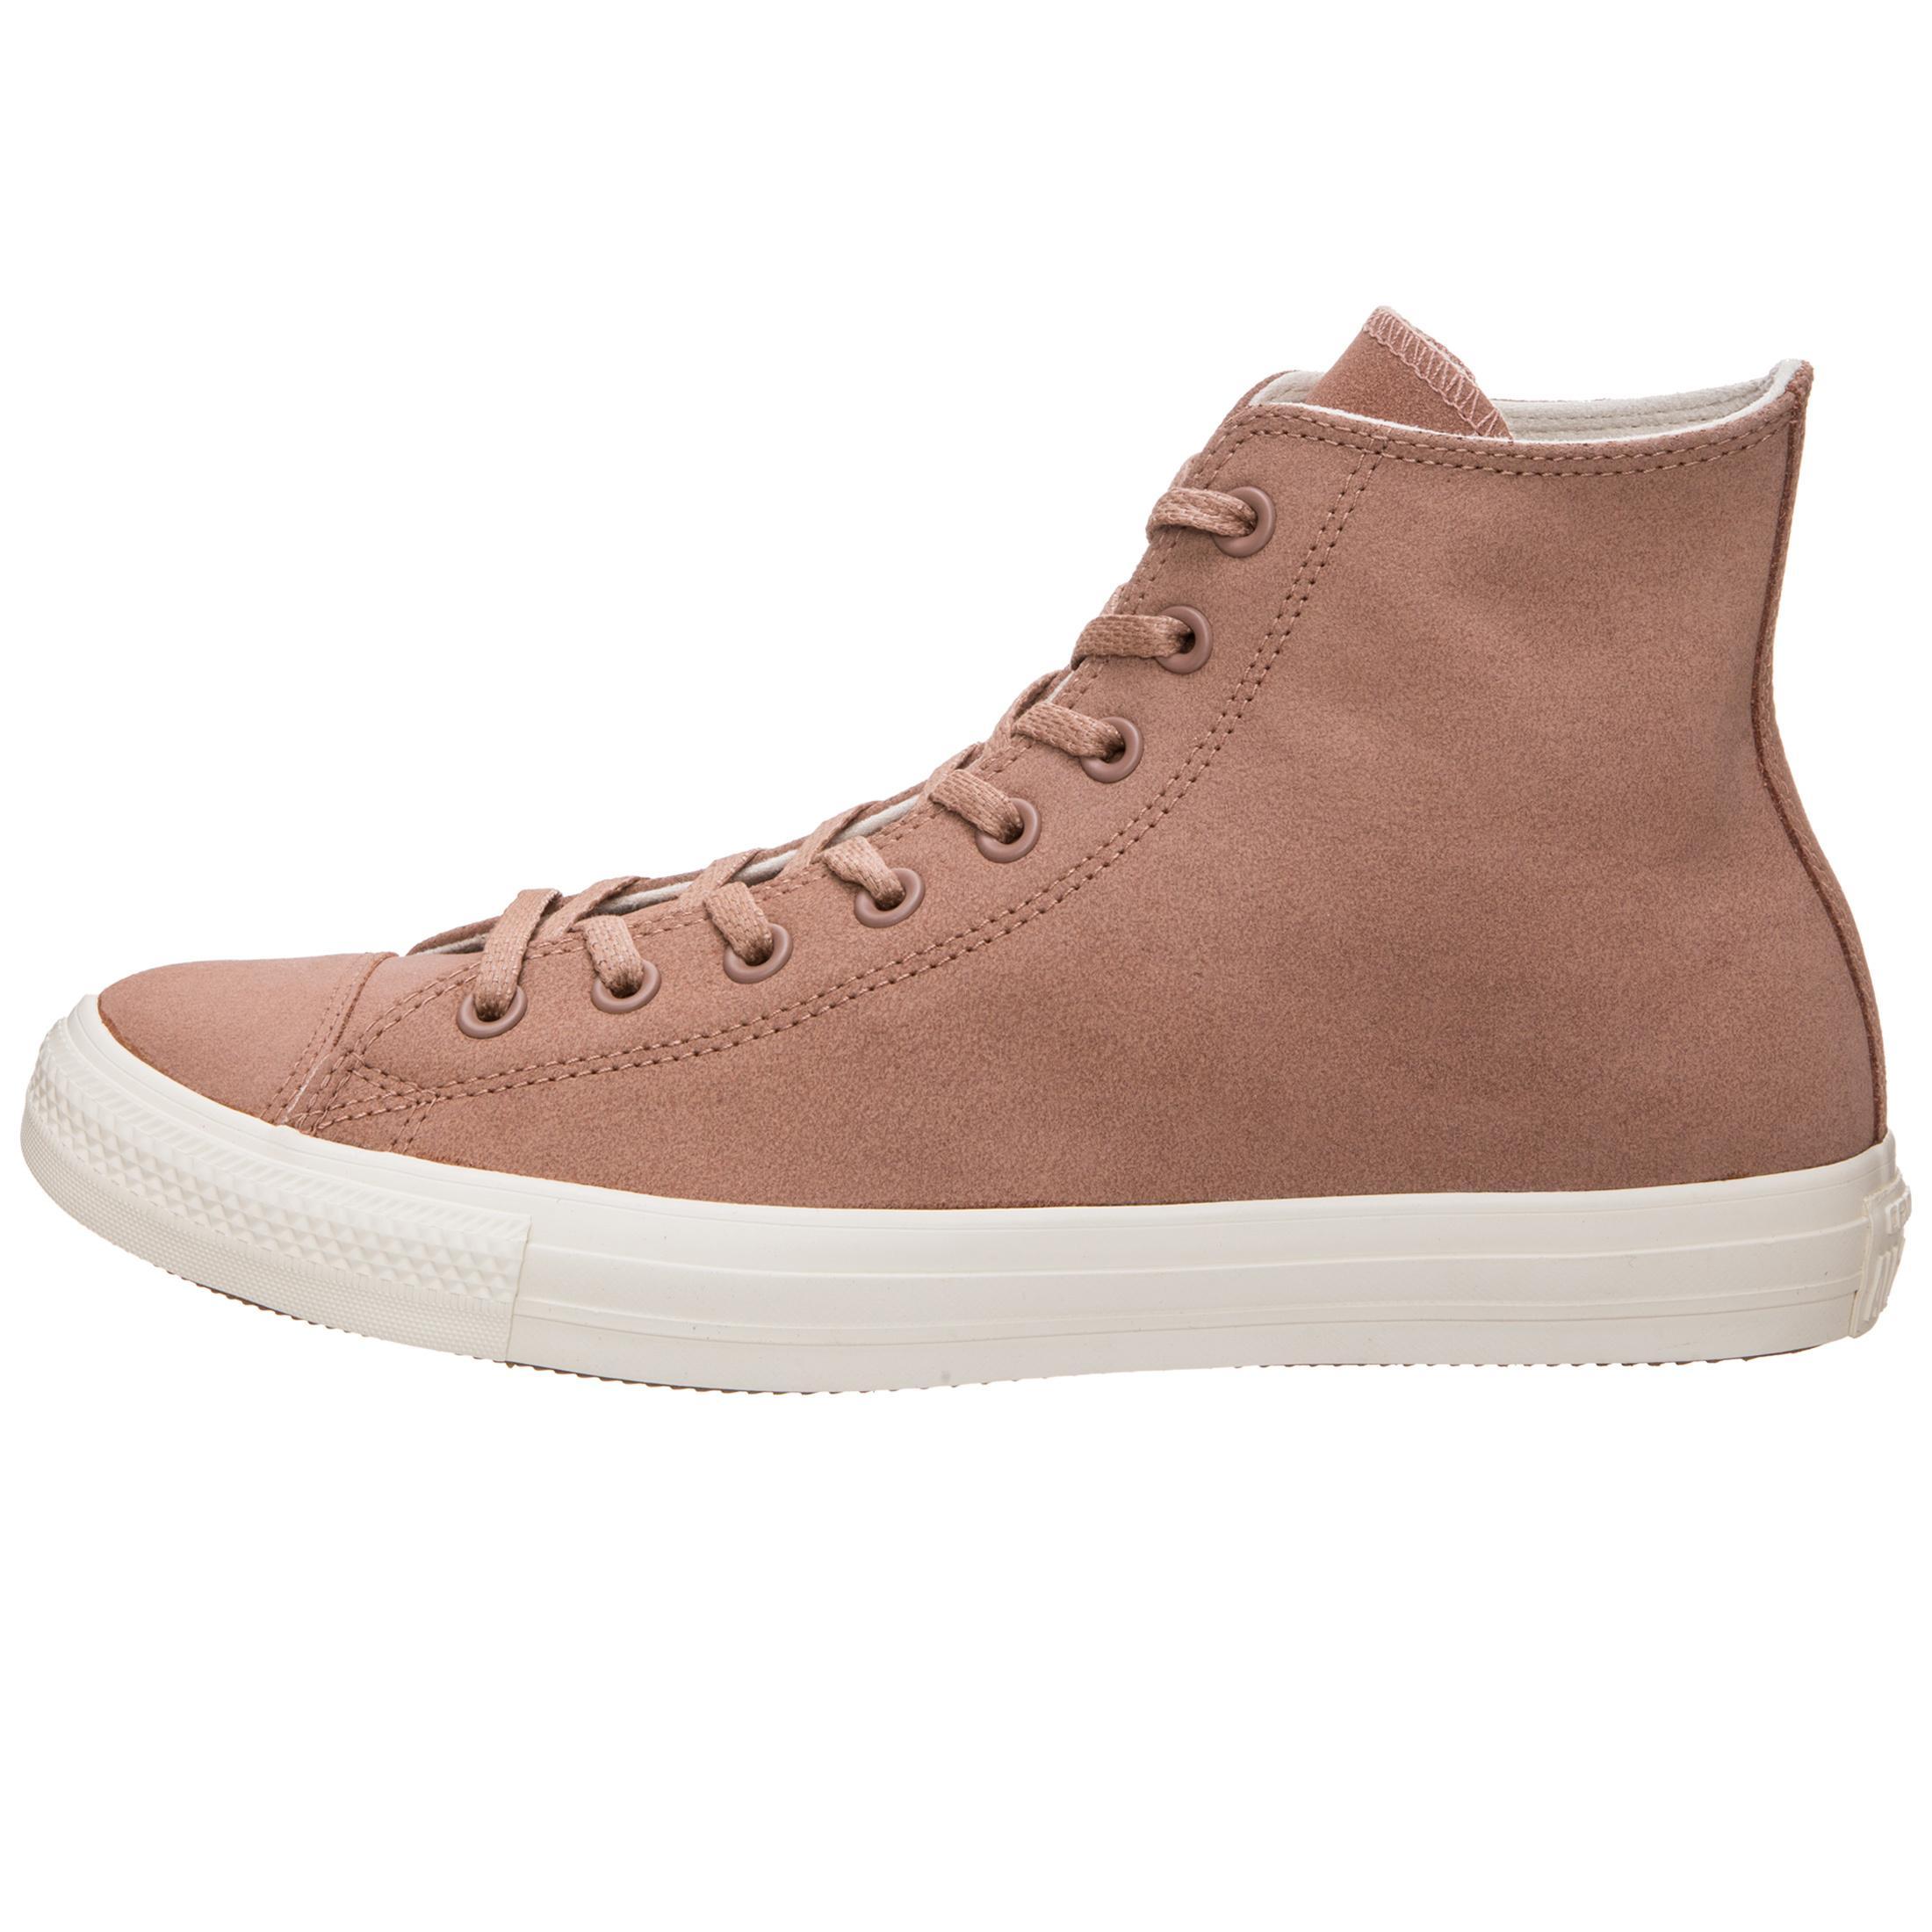 CONVERSE Chuck Taylor All Star Turnschuhe Herren altRosa altRosa altRosa im Online Shop von SportScheck kaufen Gute Qualität beliebte Schuhe d62f00